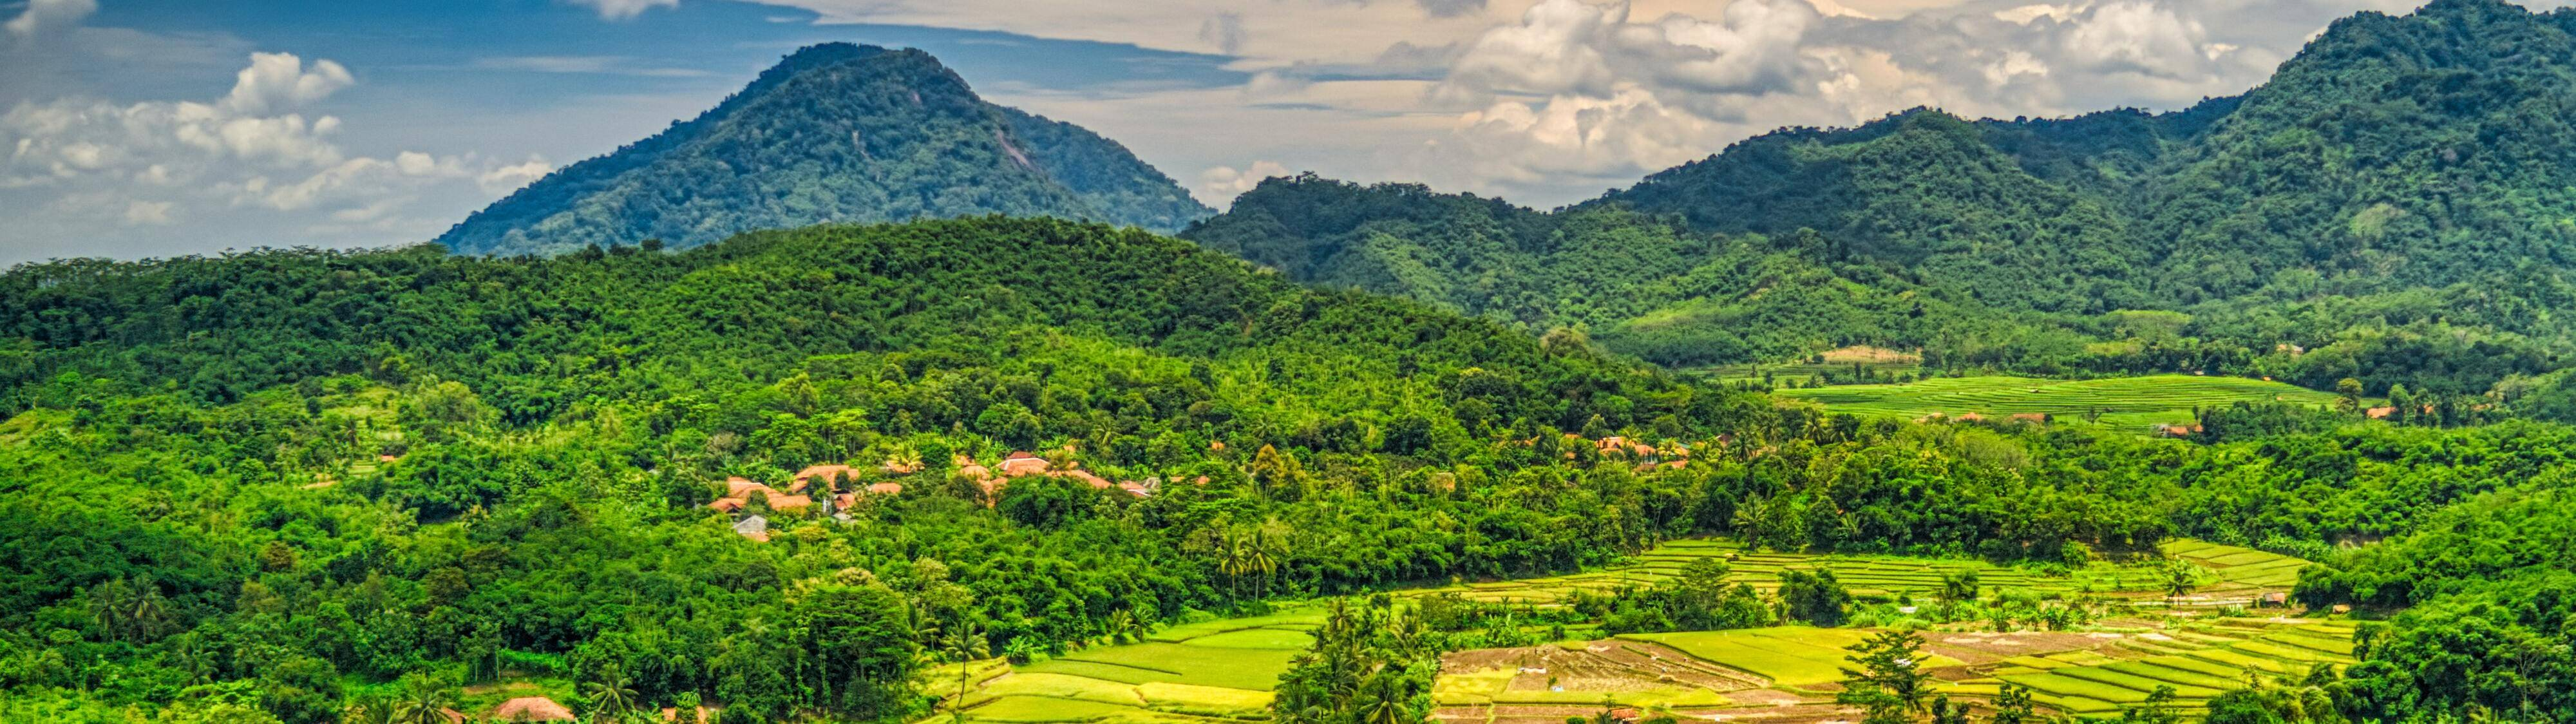 Reiseplaner Backpacking Indonesien